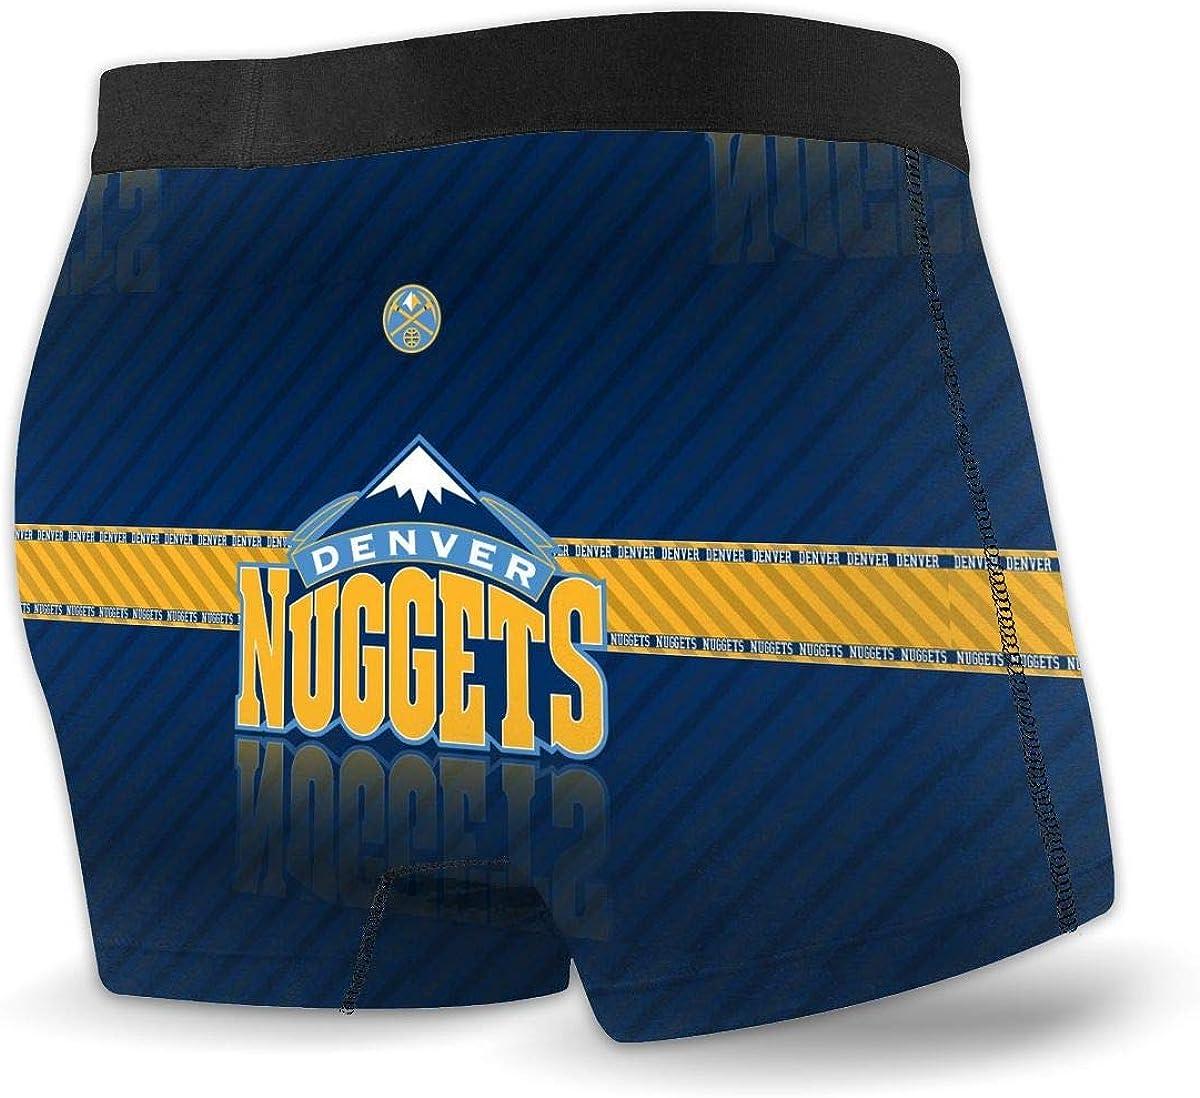 Sacramento Fans Sac Mens Boxer Briefs Underwear,Best Gift for Basketball Fans and Boyfriend